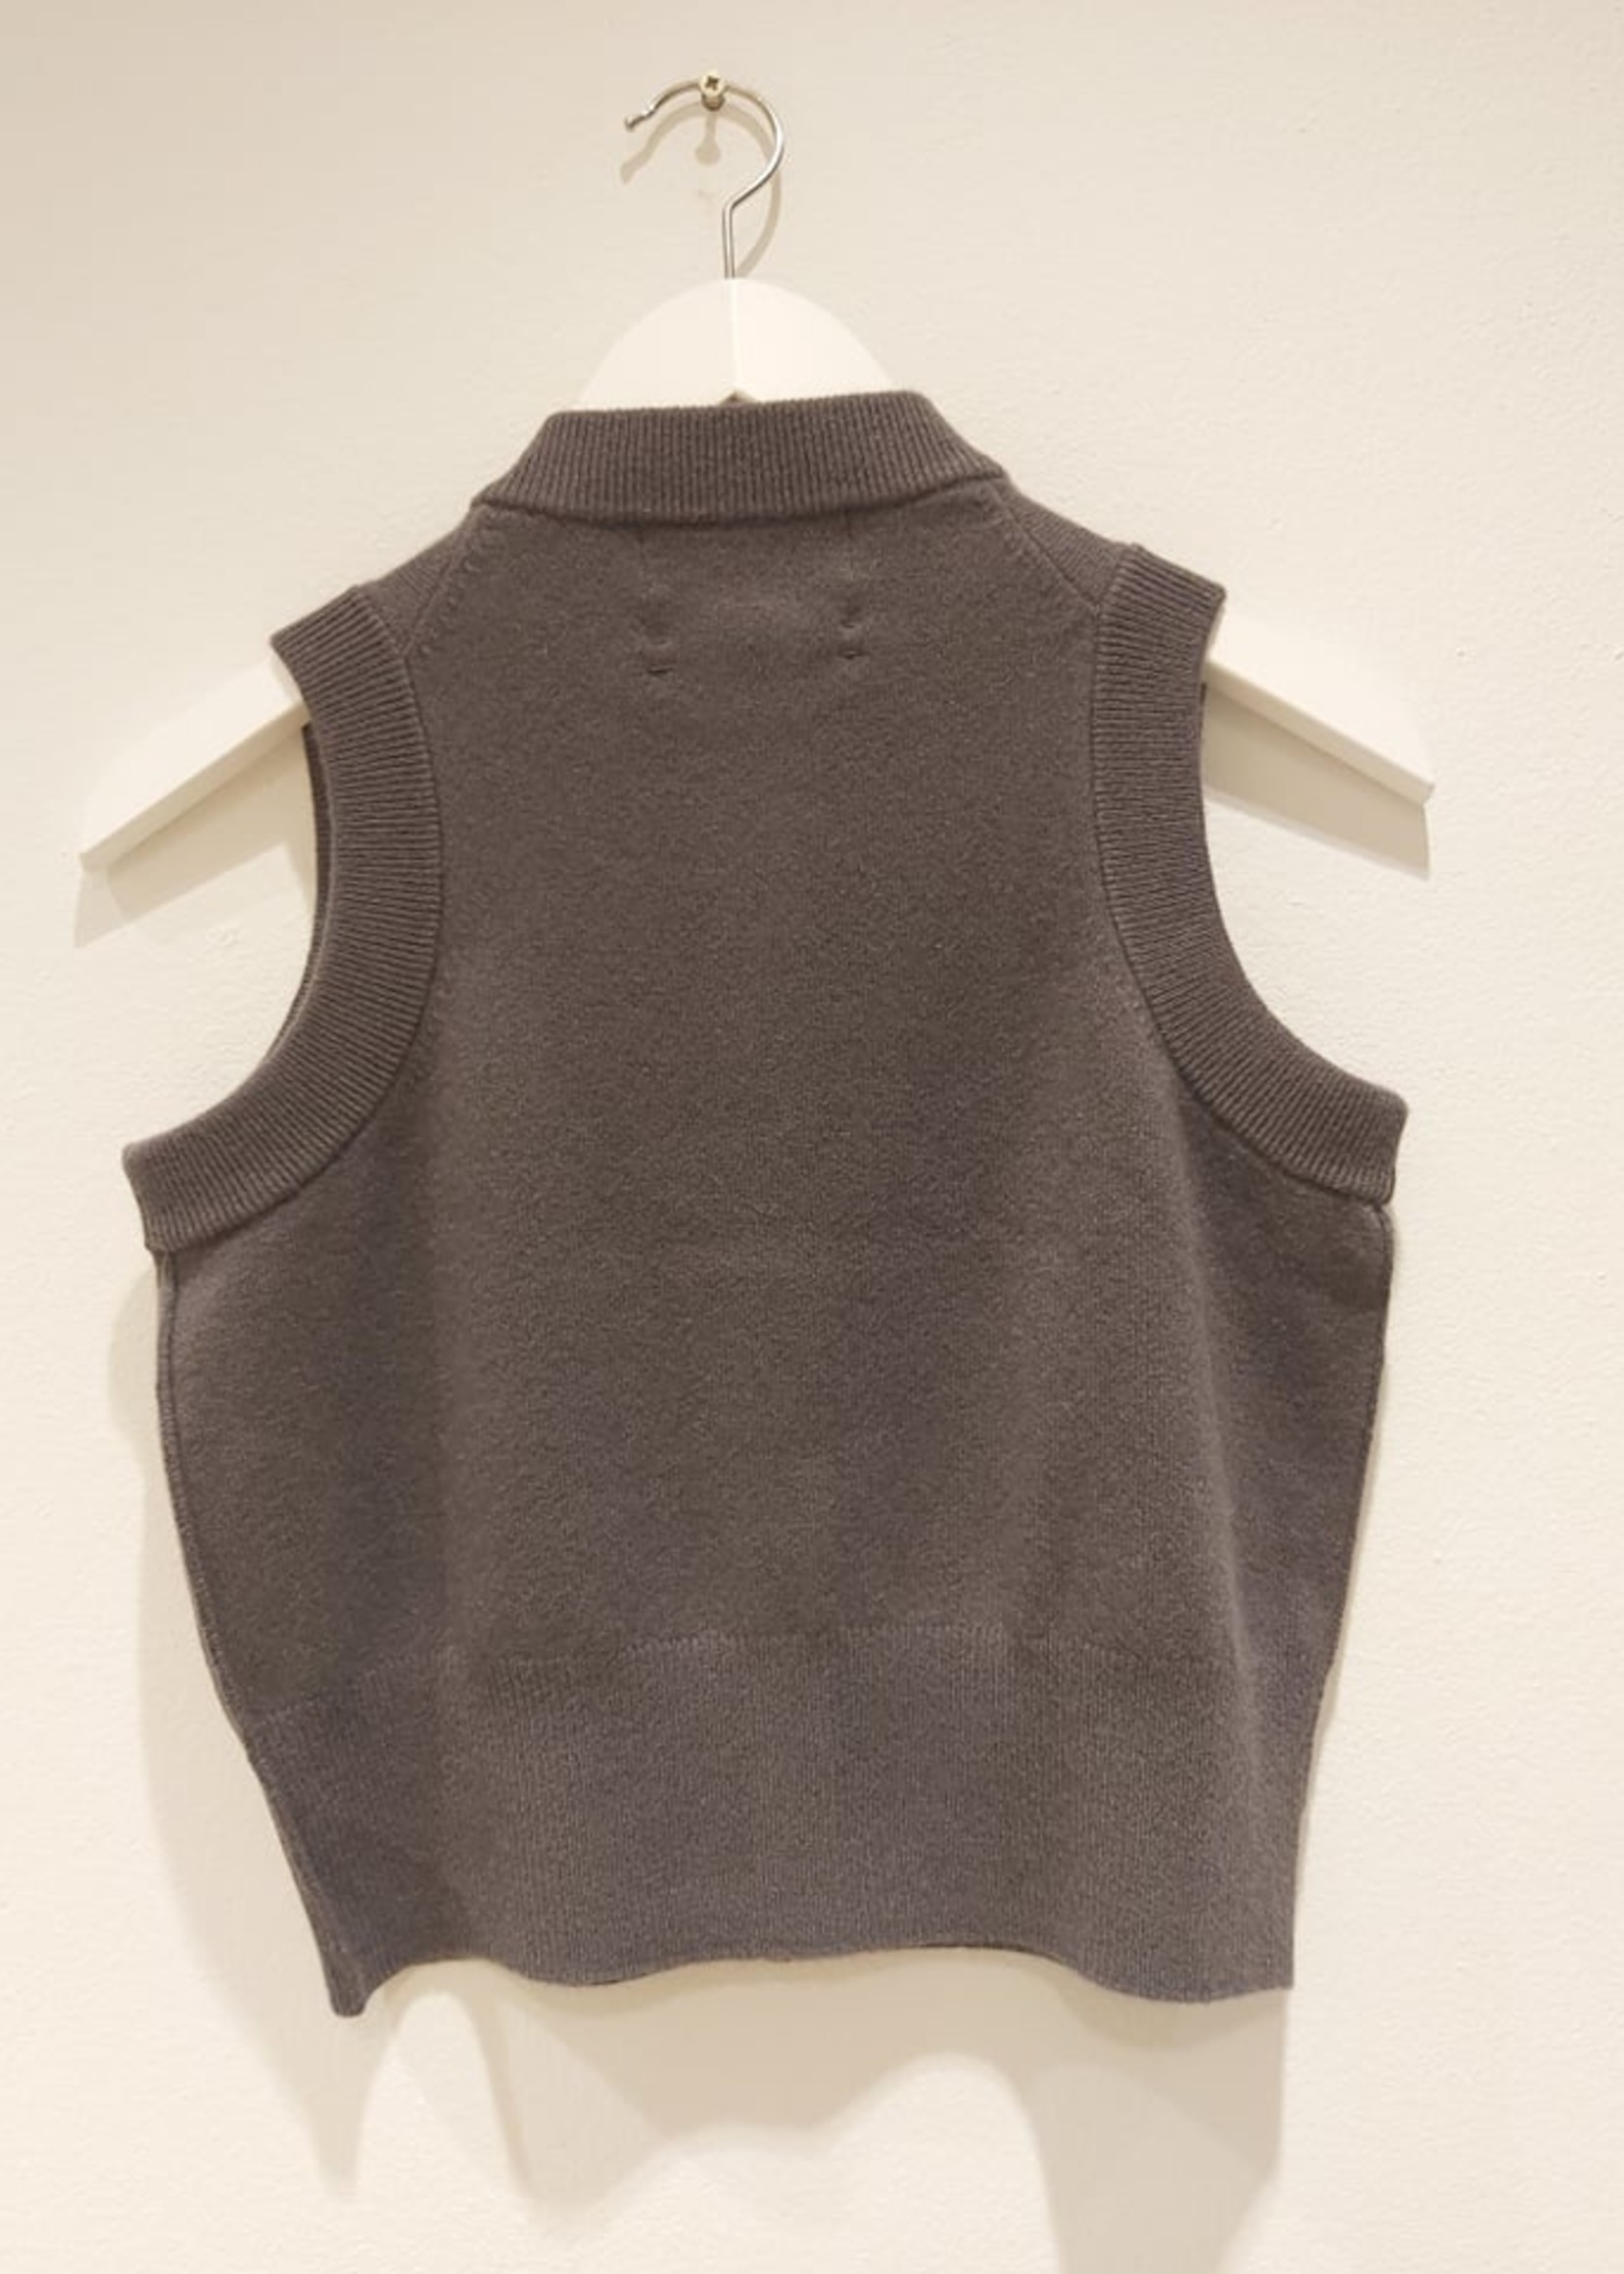 extremecashmere x extreme cashmere x corset ,concrete